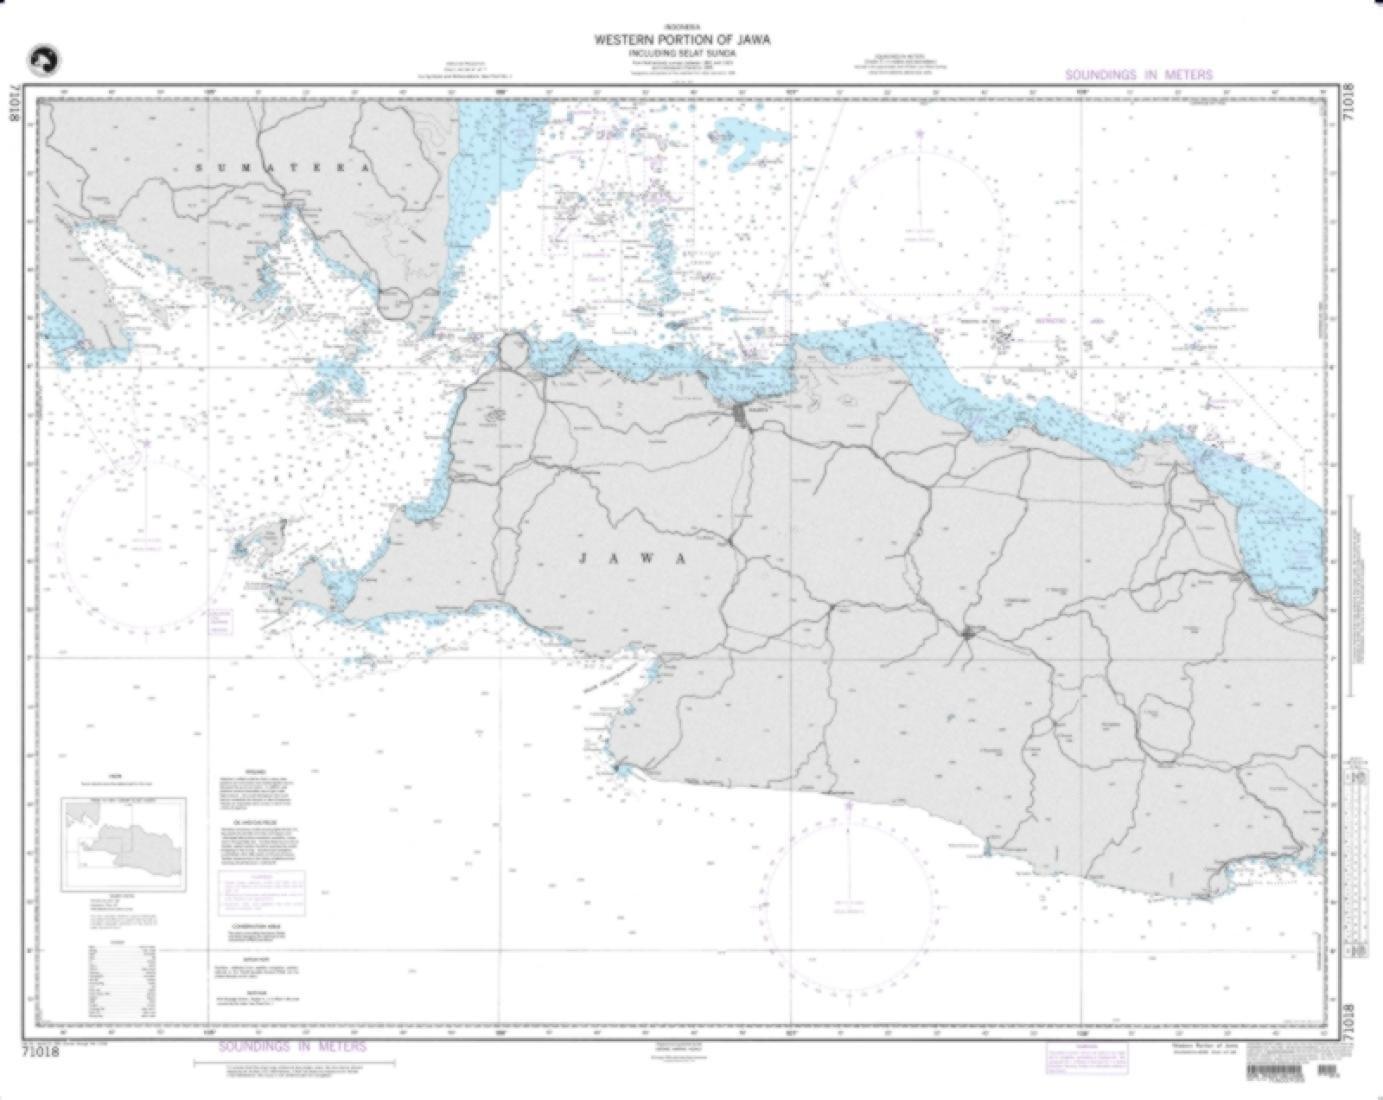 NGA Chart 71018-Western Portion Of Jawa